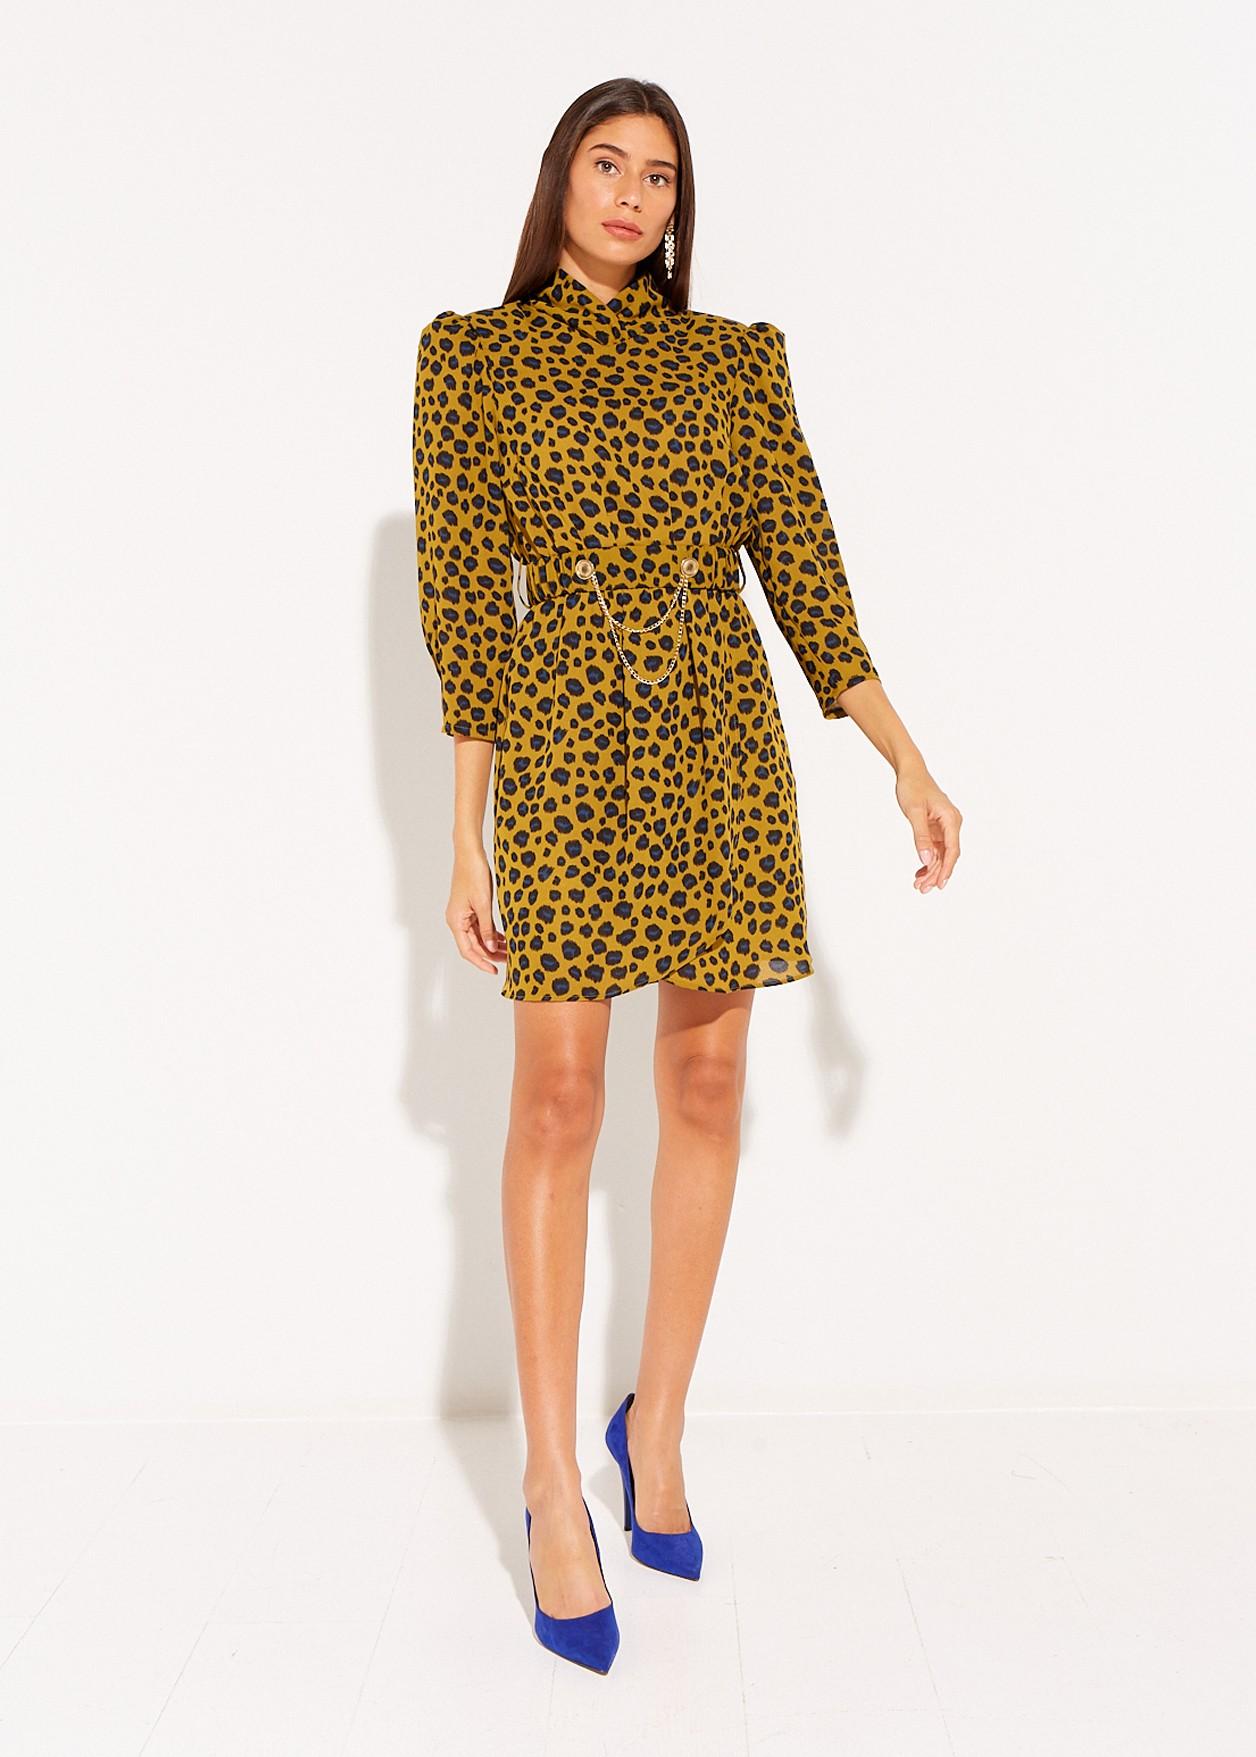 Animal print dress with shoulder pads